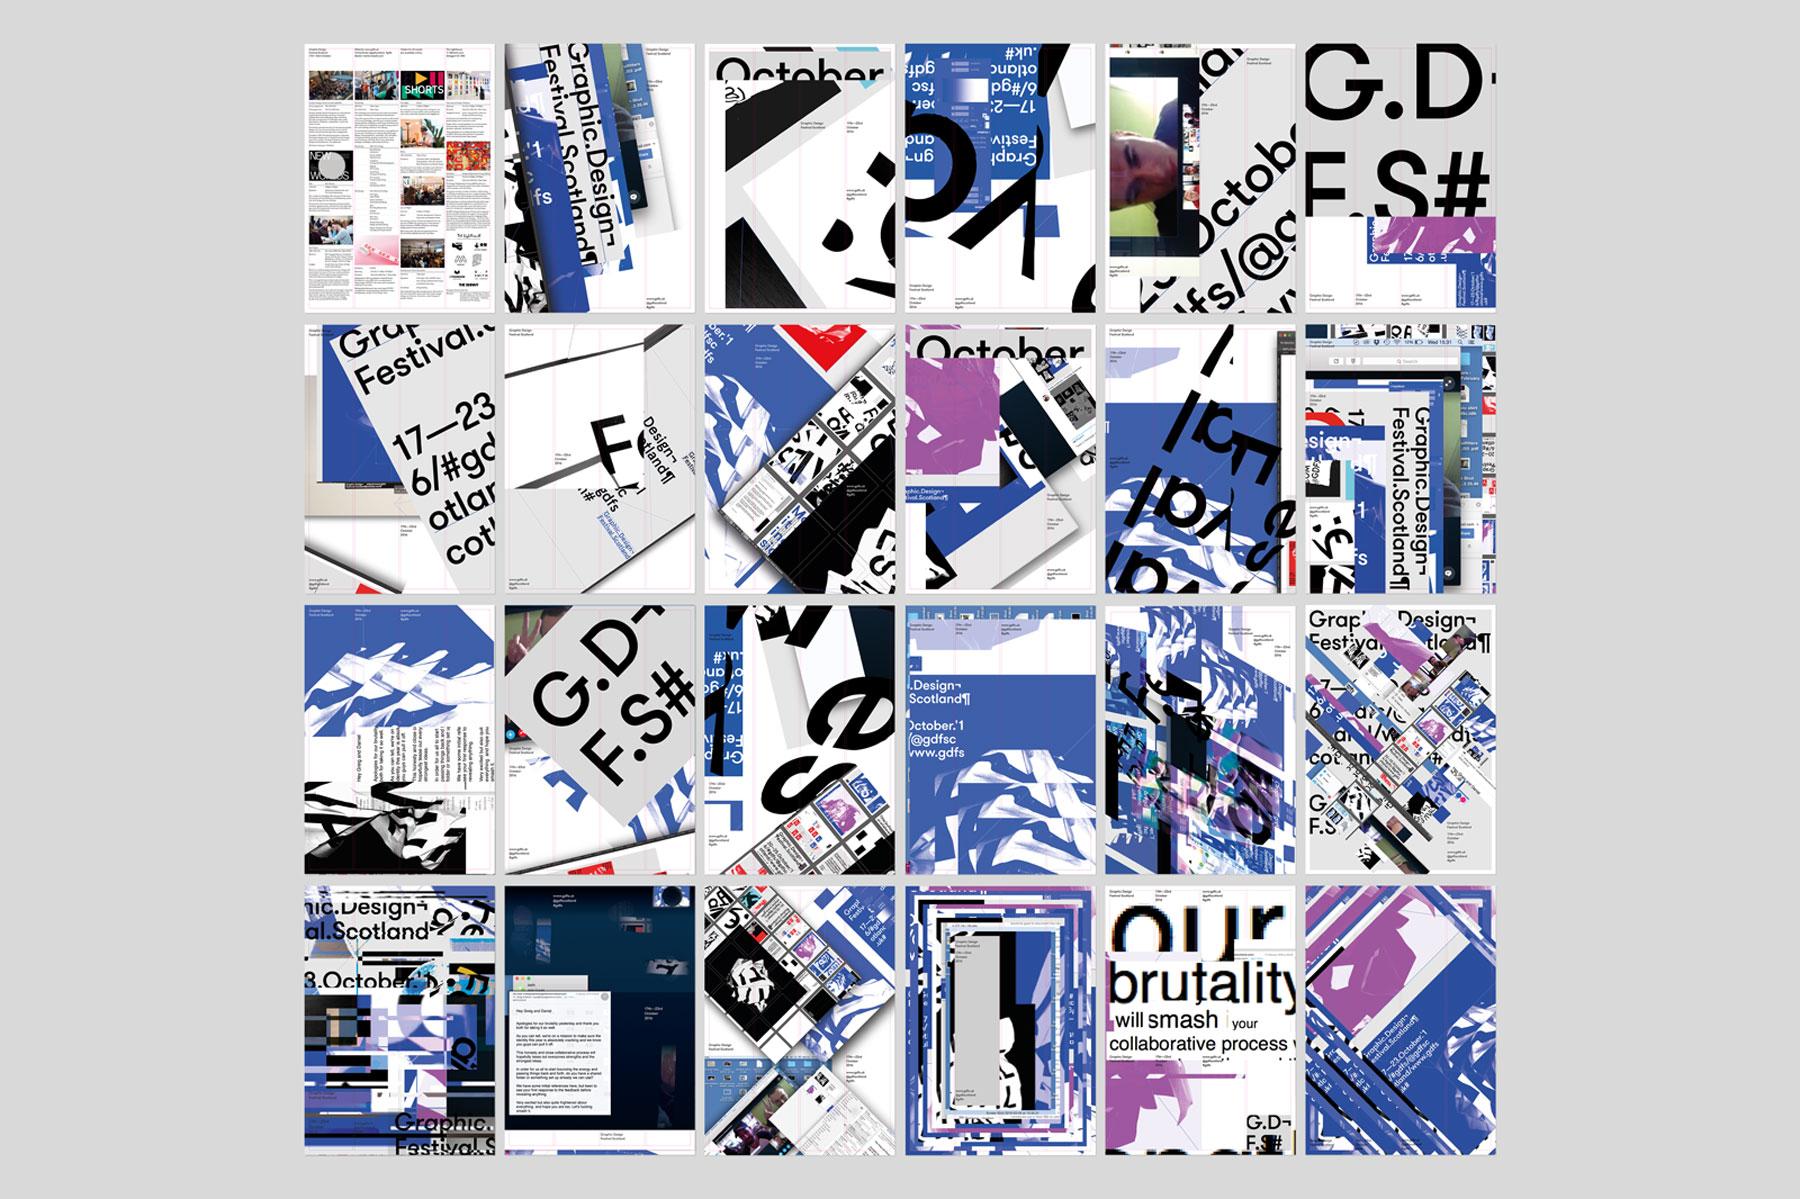 11gdfs-16-custom-identity-posters